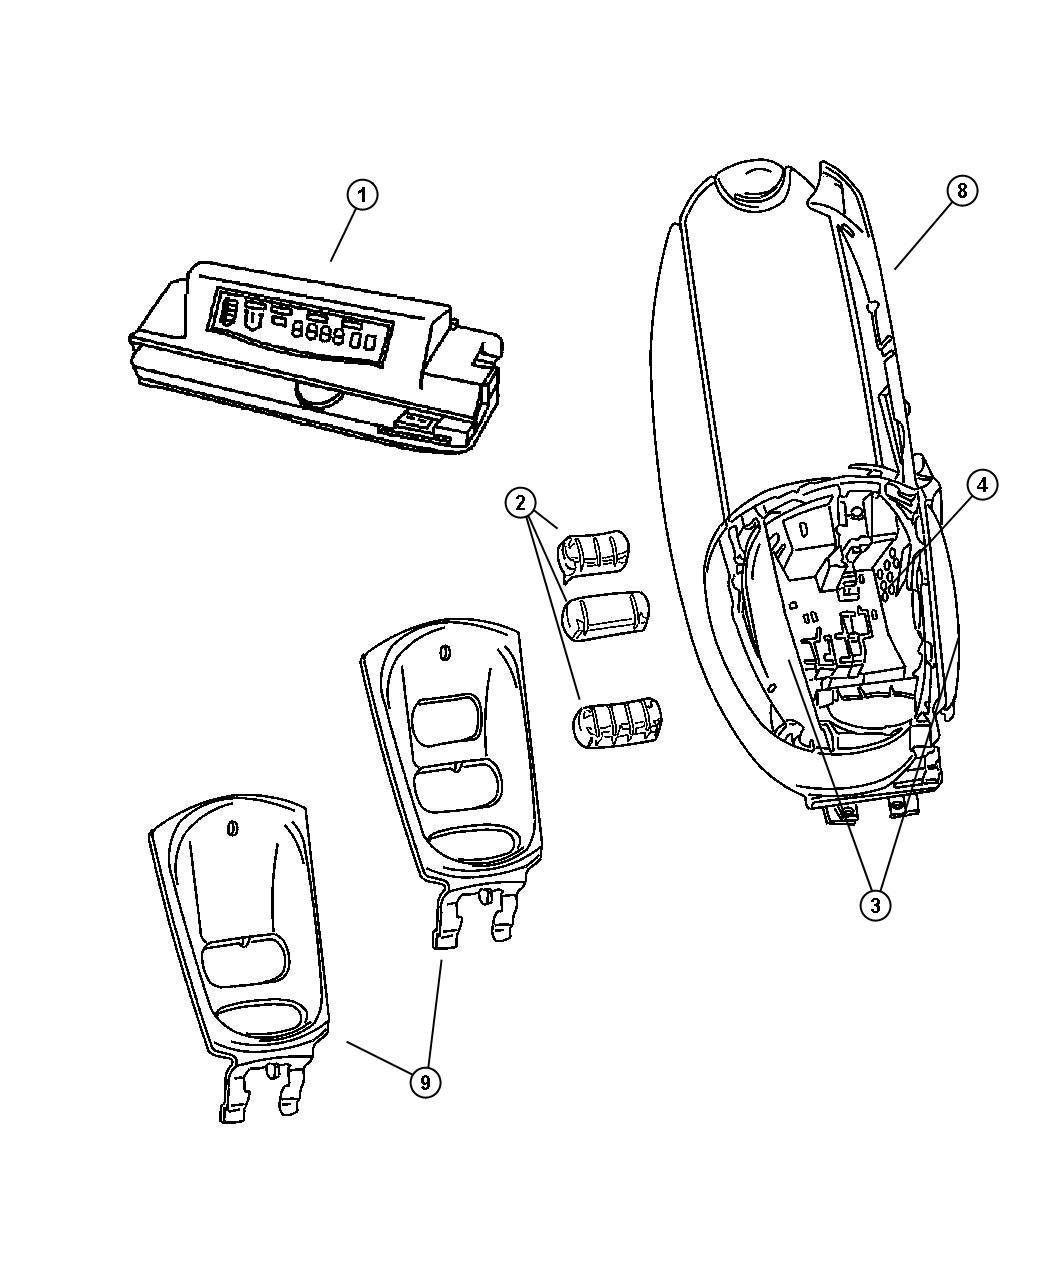 00 Mitsubishi Mirage Fuse Box. Mitsubishi. Auto Wiring Diagram